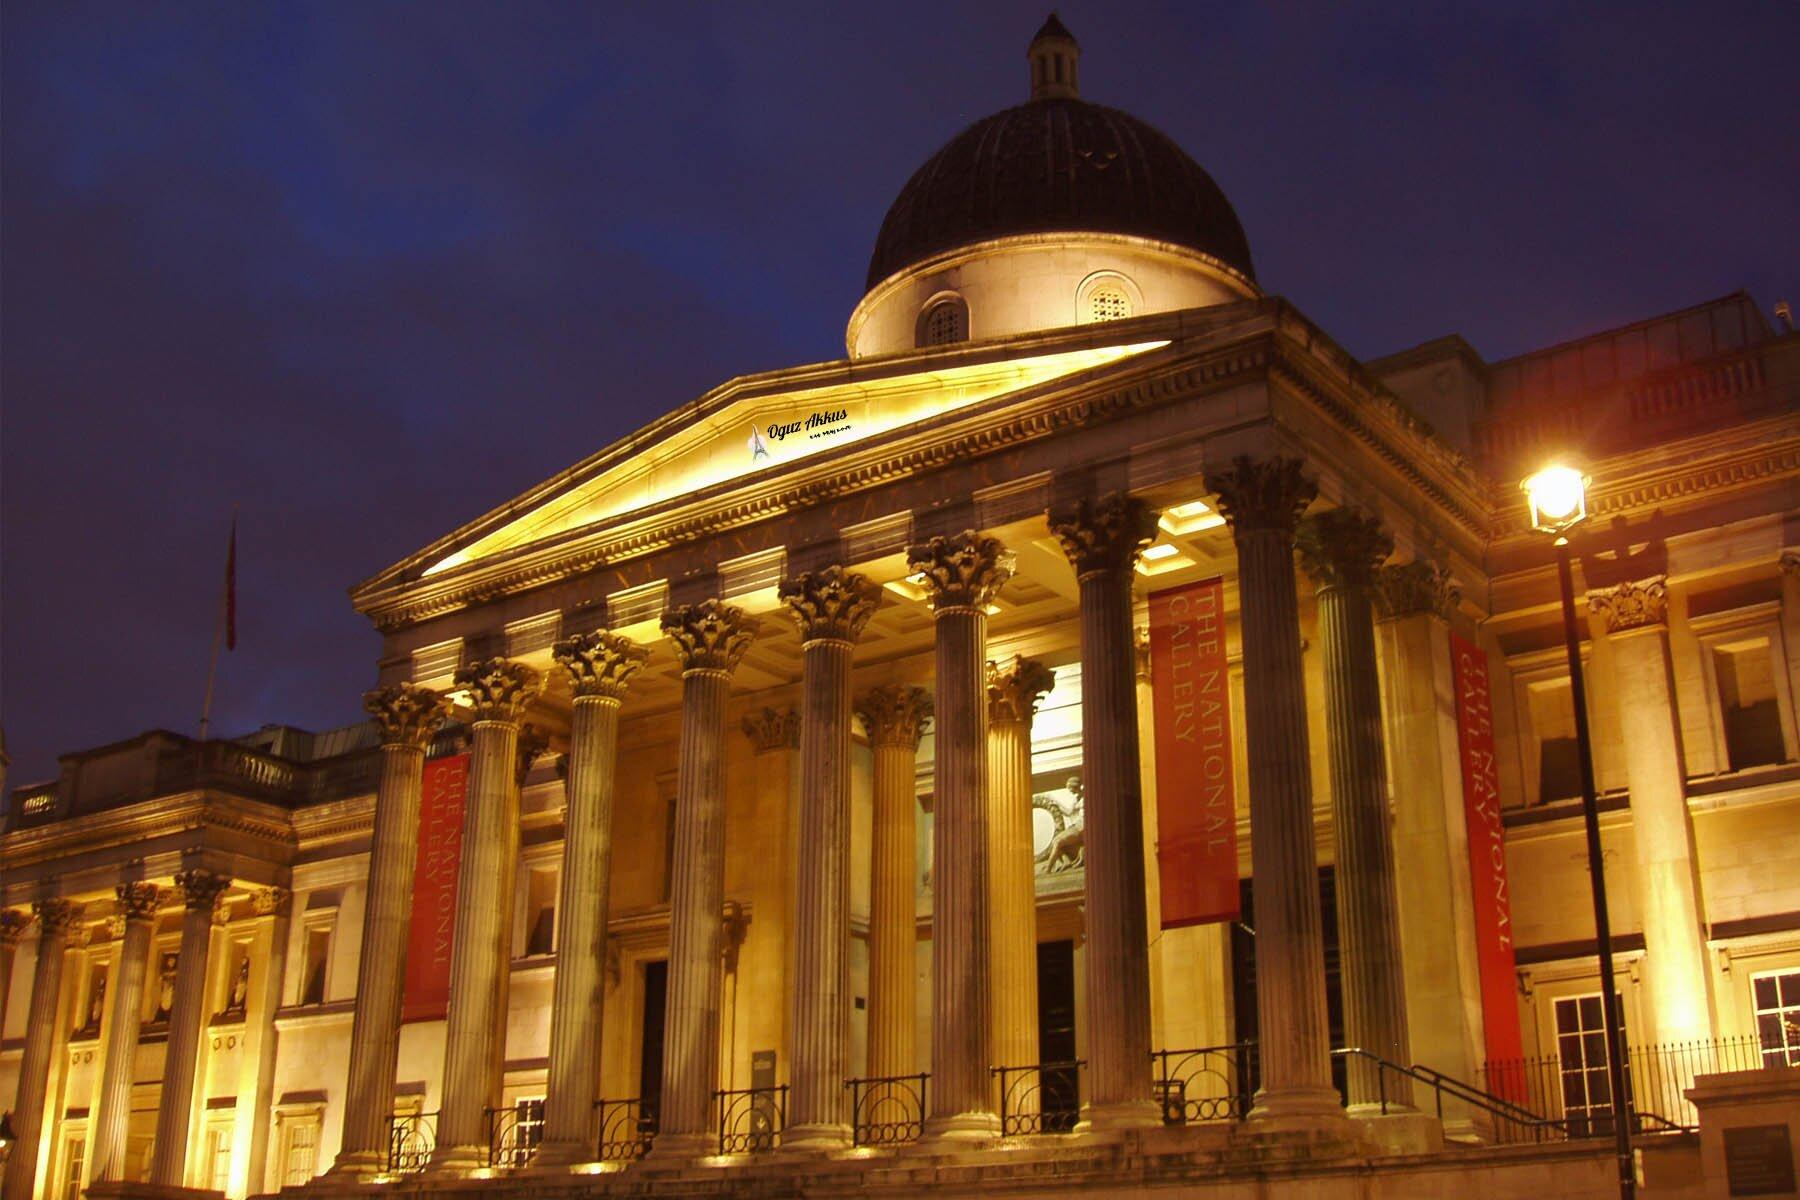 Londra Ulusal Galeri